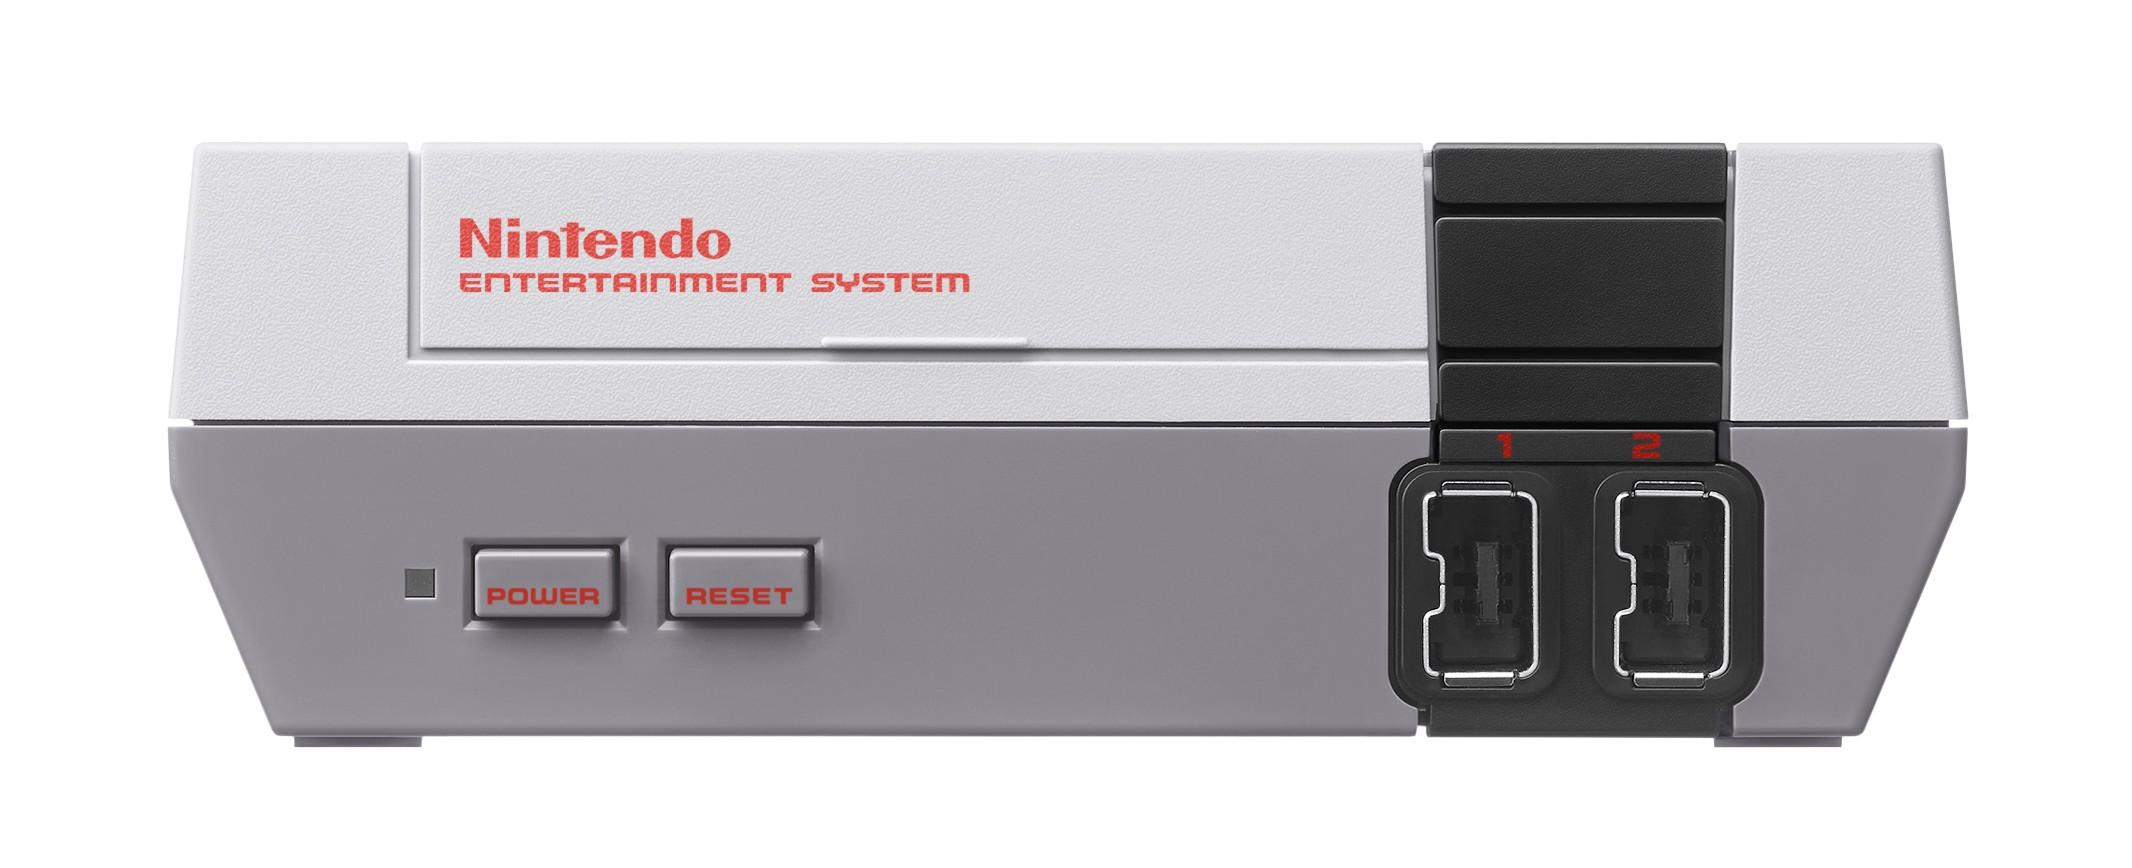 Imagenes De Bose >> Consola NES Classic Edition Alkosto Tienda Online